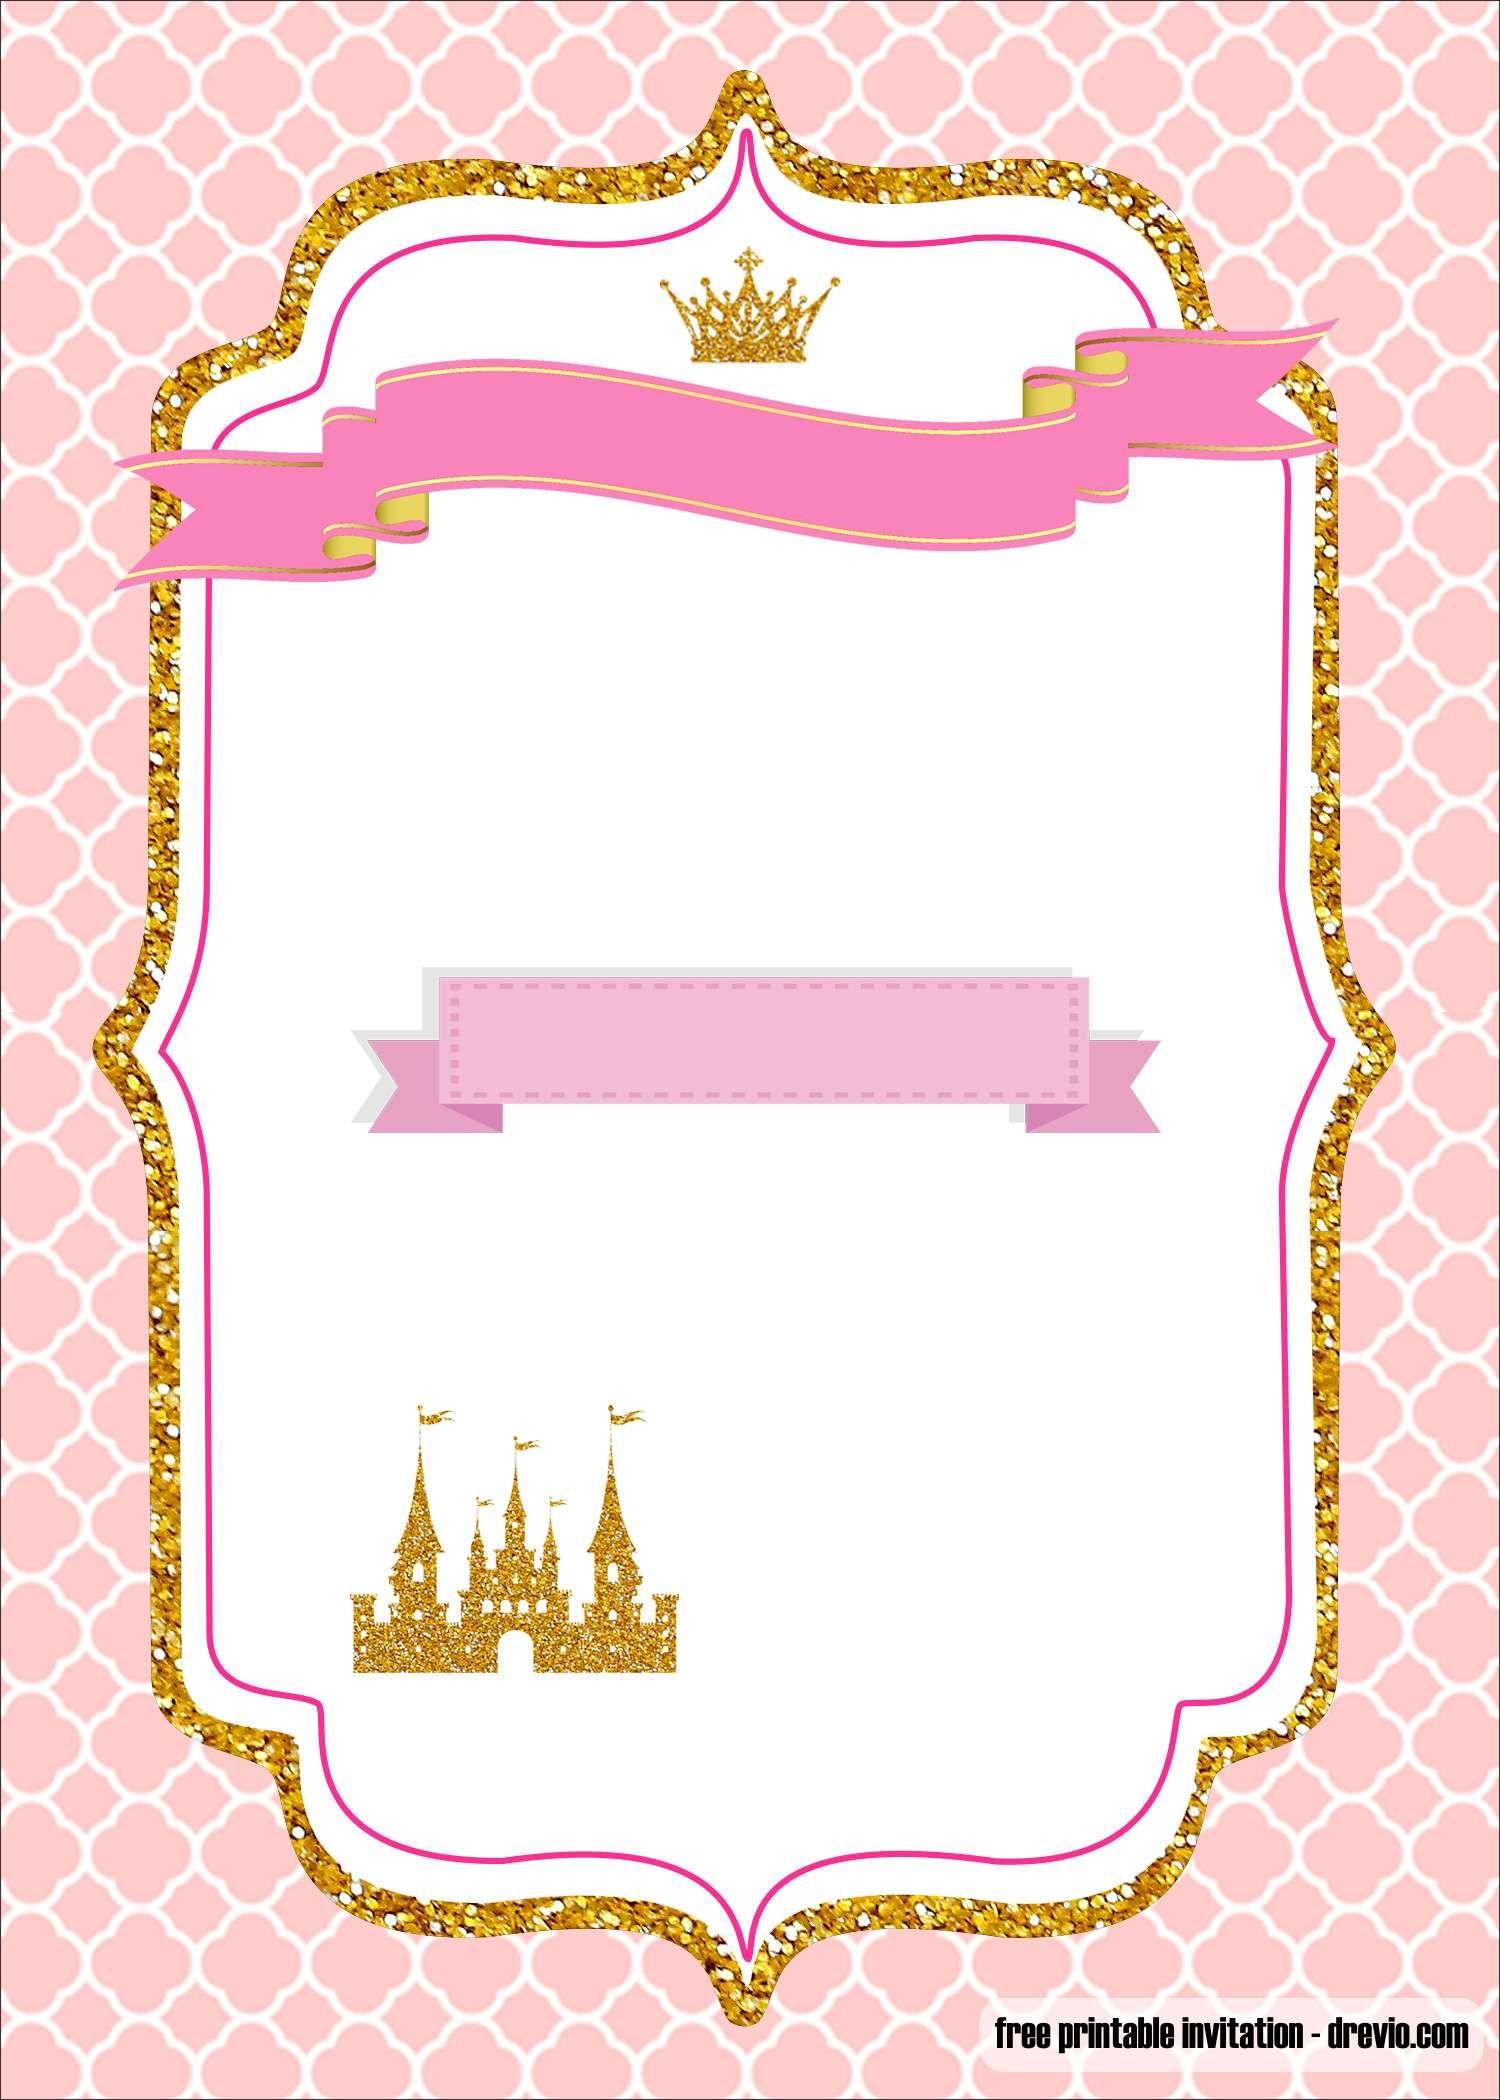 Free Printable Royal Princess Party Invitation